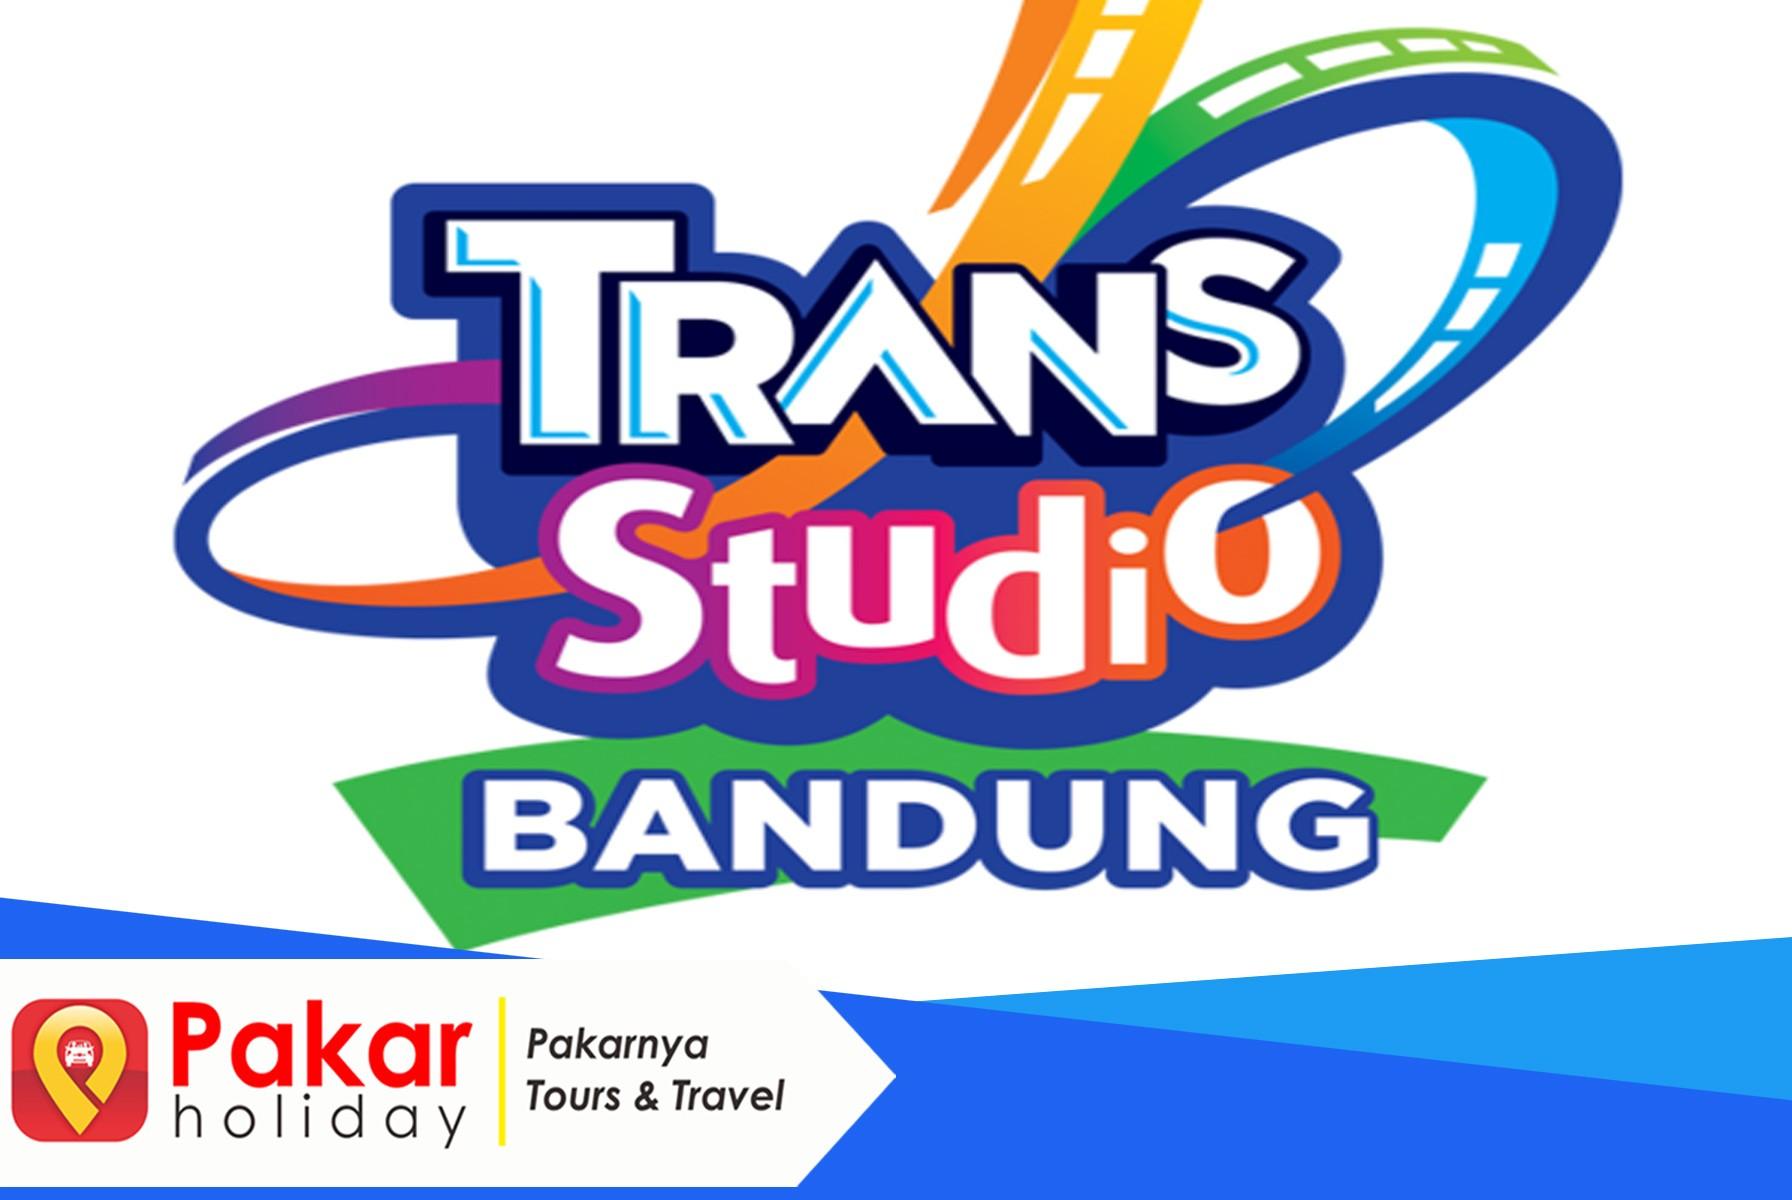 TIKET MURAH TRANS STUDIO BANDUNG